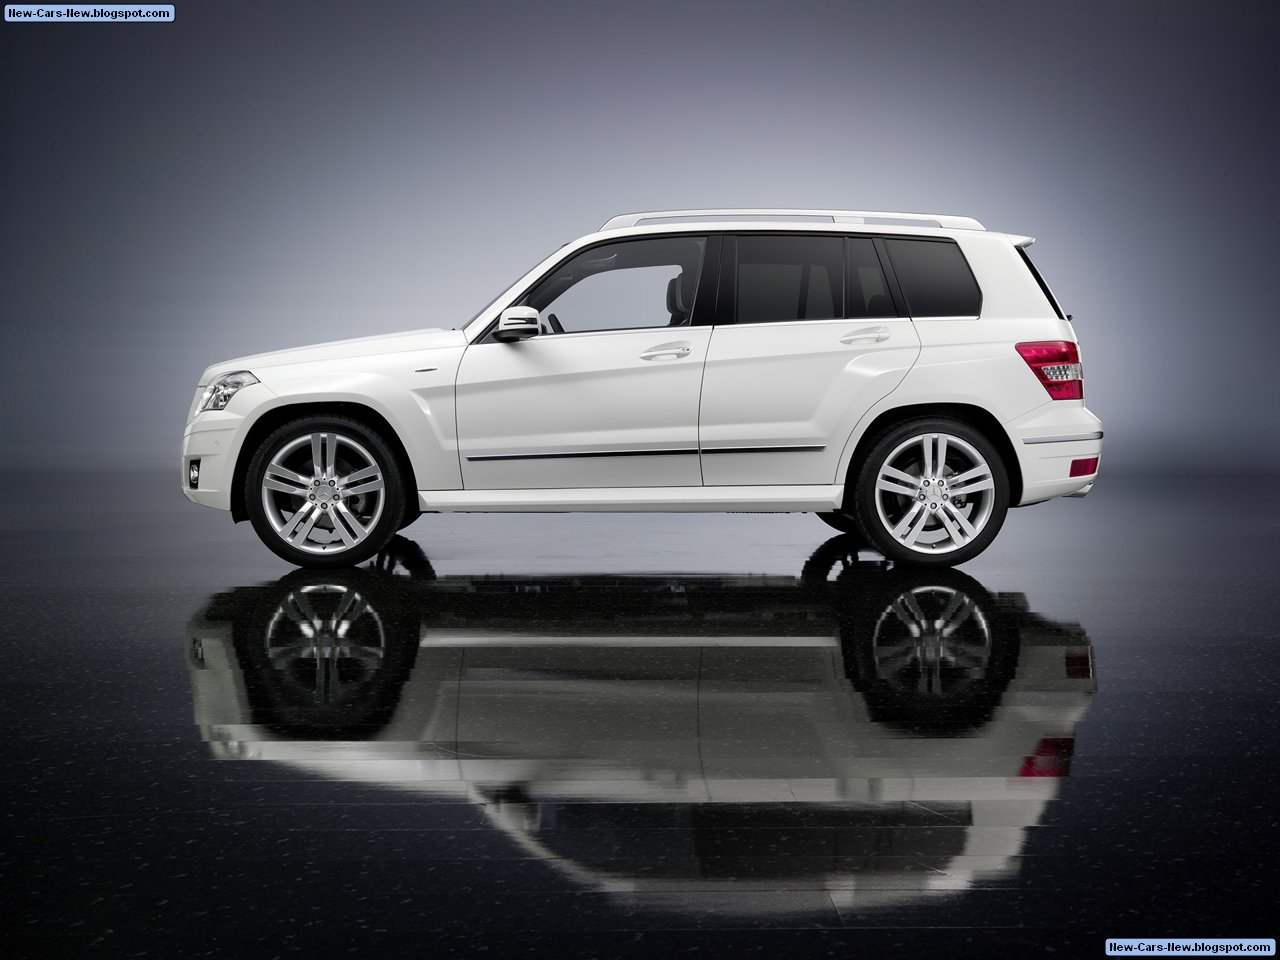 mercedes benz glk 350 4matic 2010 all in car mercedes benz glk 350 4matic 2010. Black Bedroom Furniture Sets. Home Design Ideas